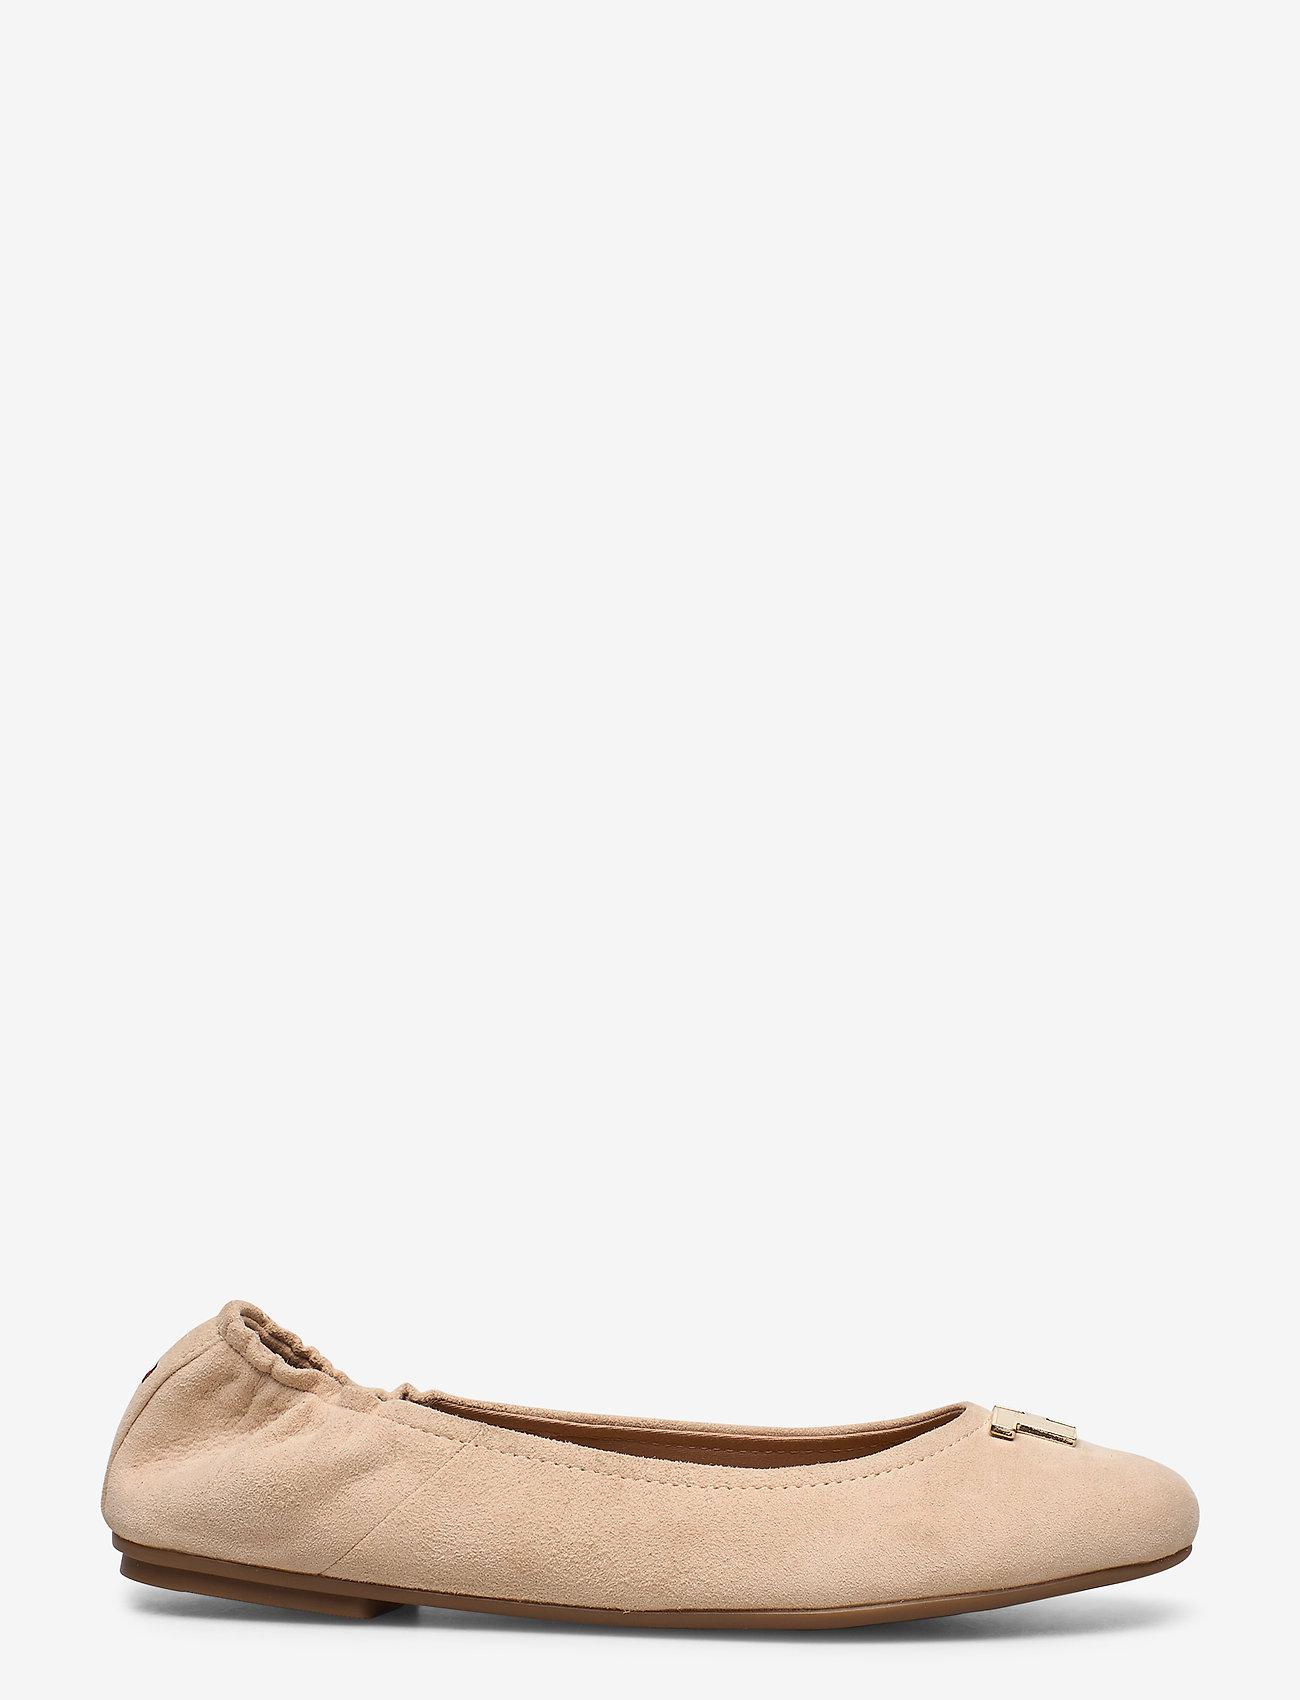 Tommy Hilfiger - TH HARDWARE BALLERINA - ballerinas - clayed pebble - 1